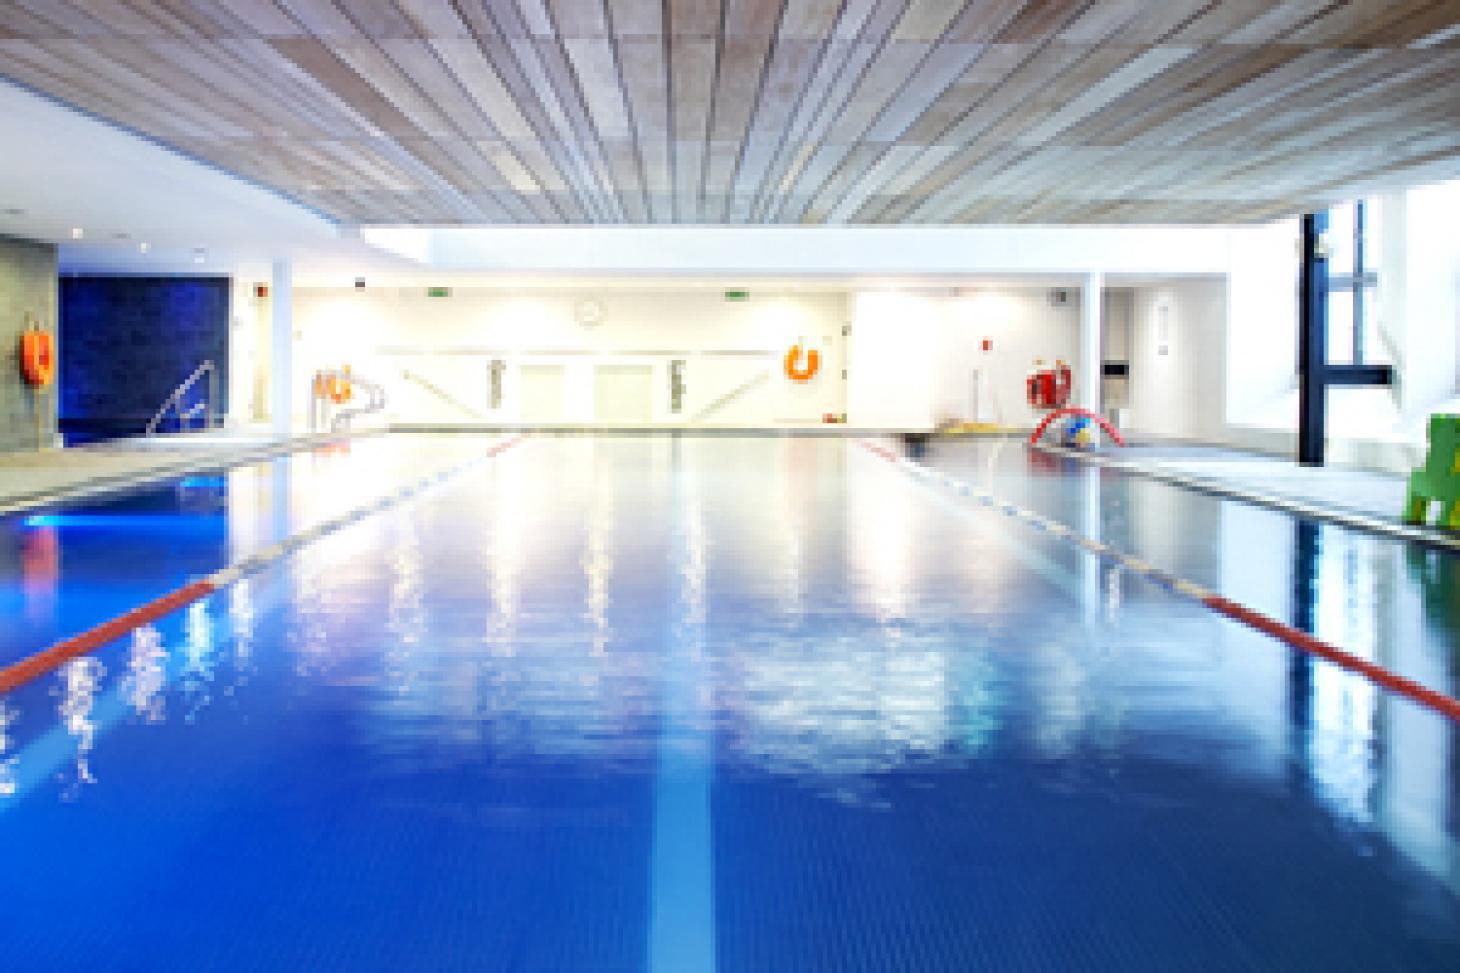 LA Fitness Edgware Indoor swimming pool